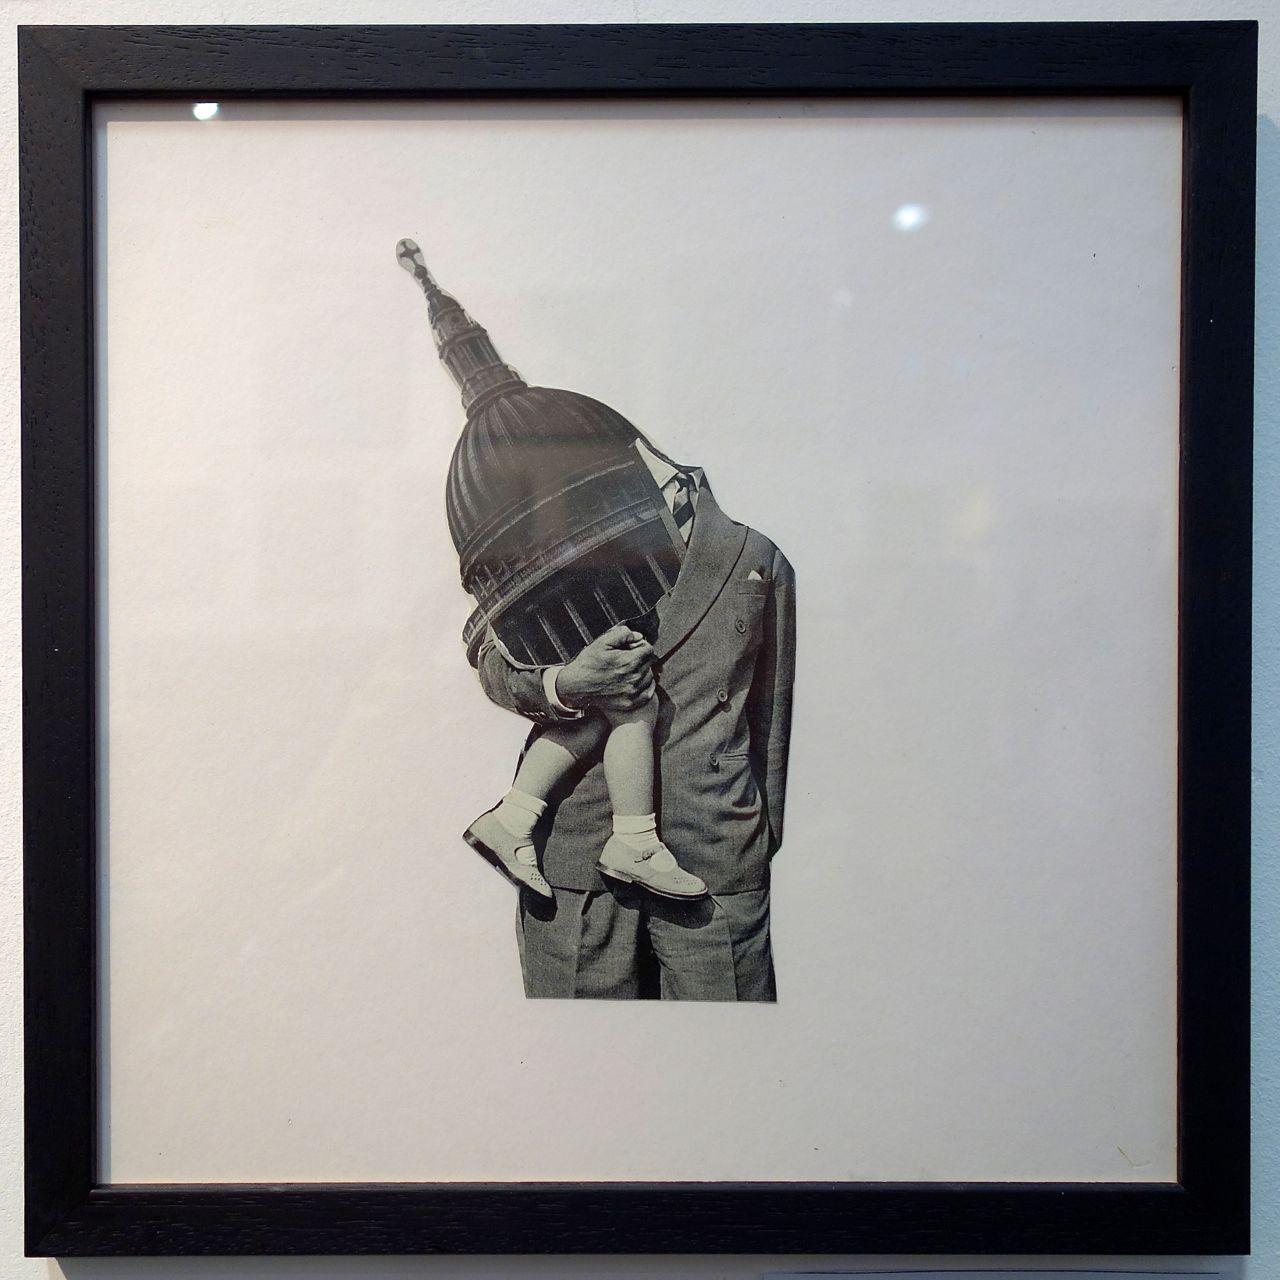 Pum, 'Architect', Collage. Broth Art (London)